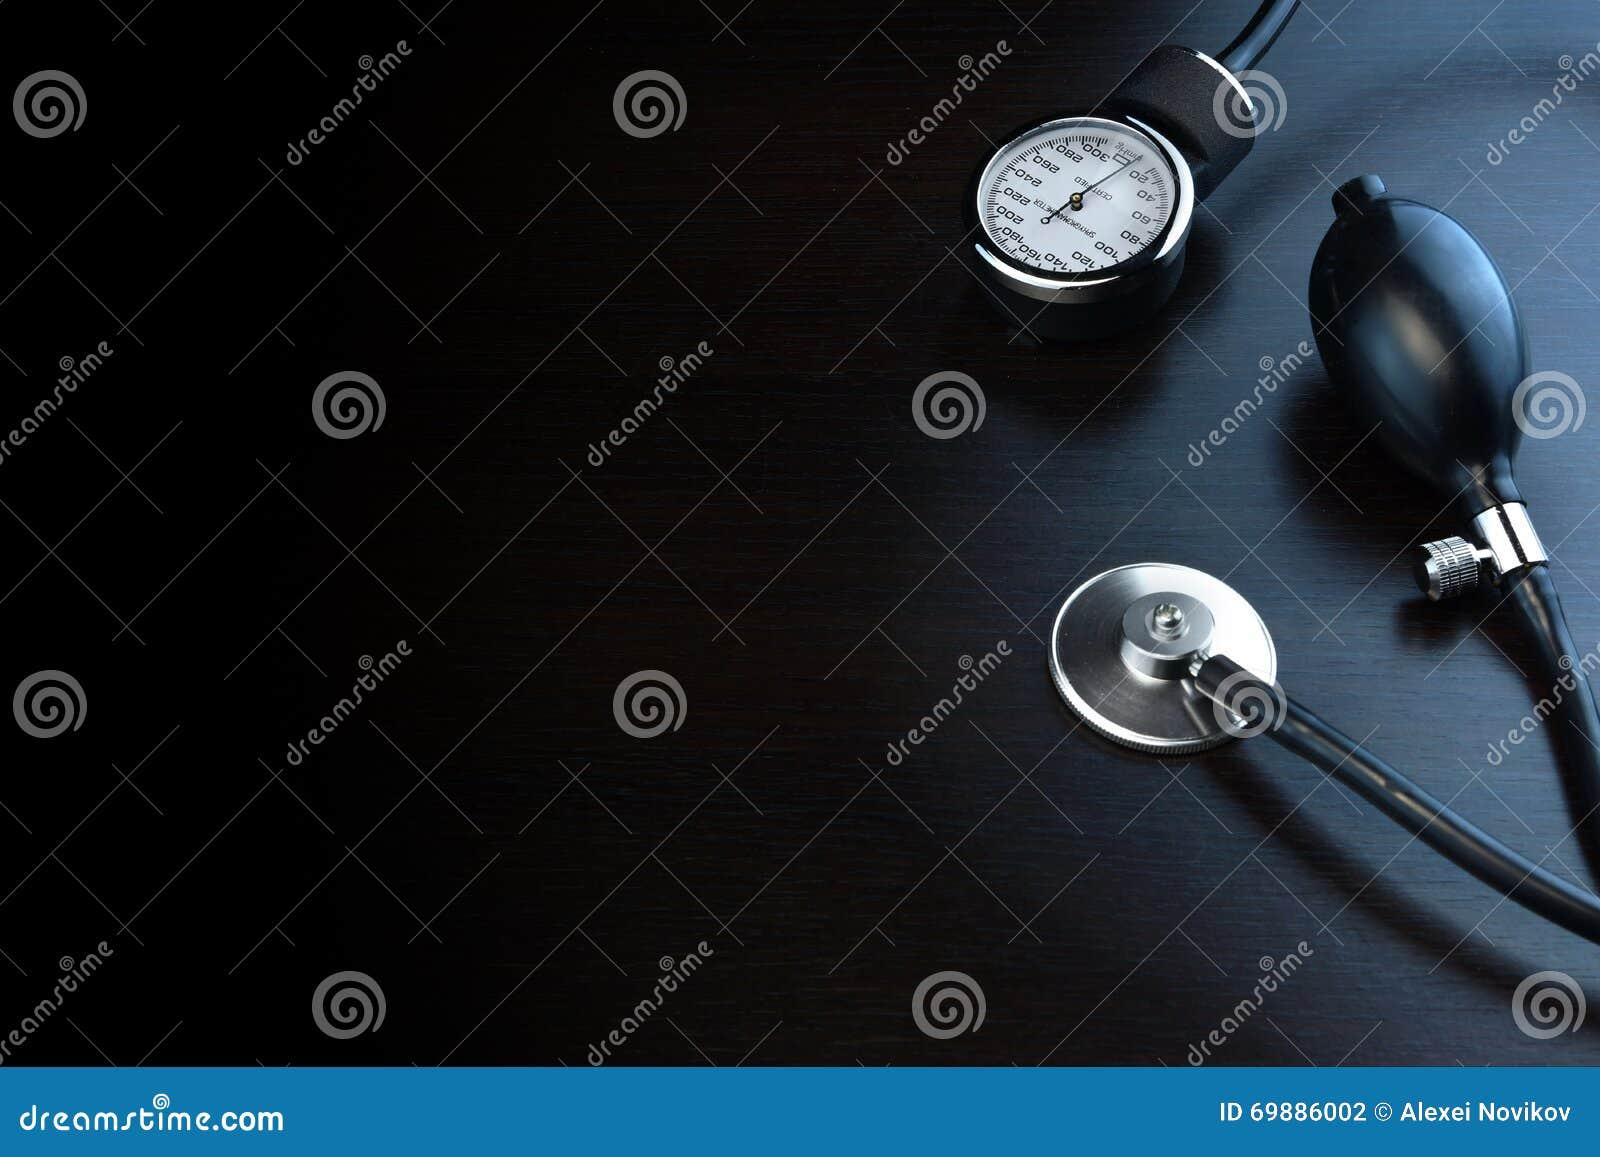 Cardiology Medical Equipment On Black Wooden Background In Back